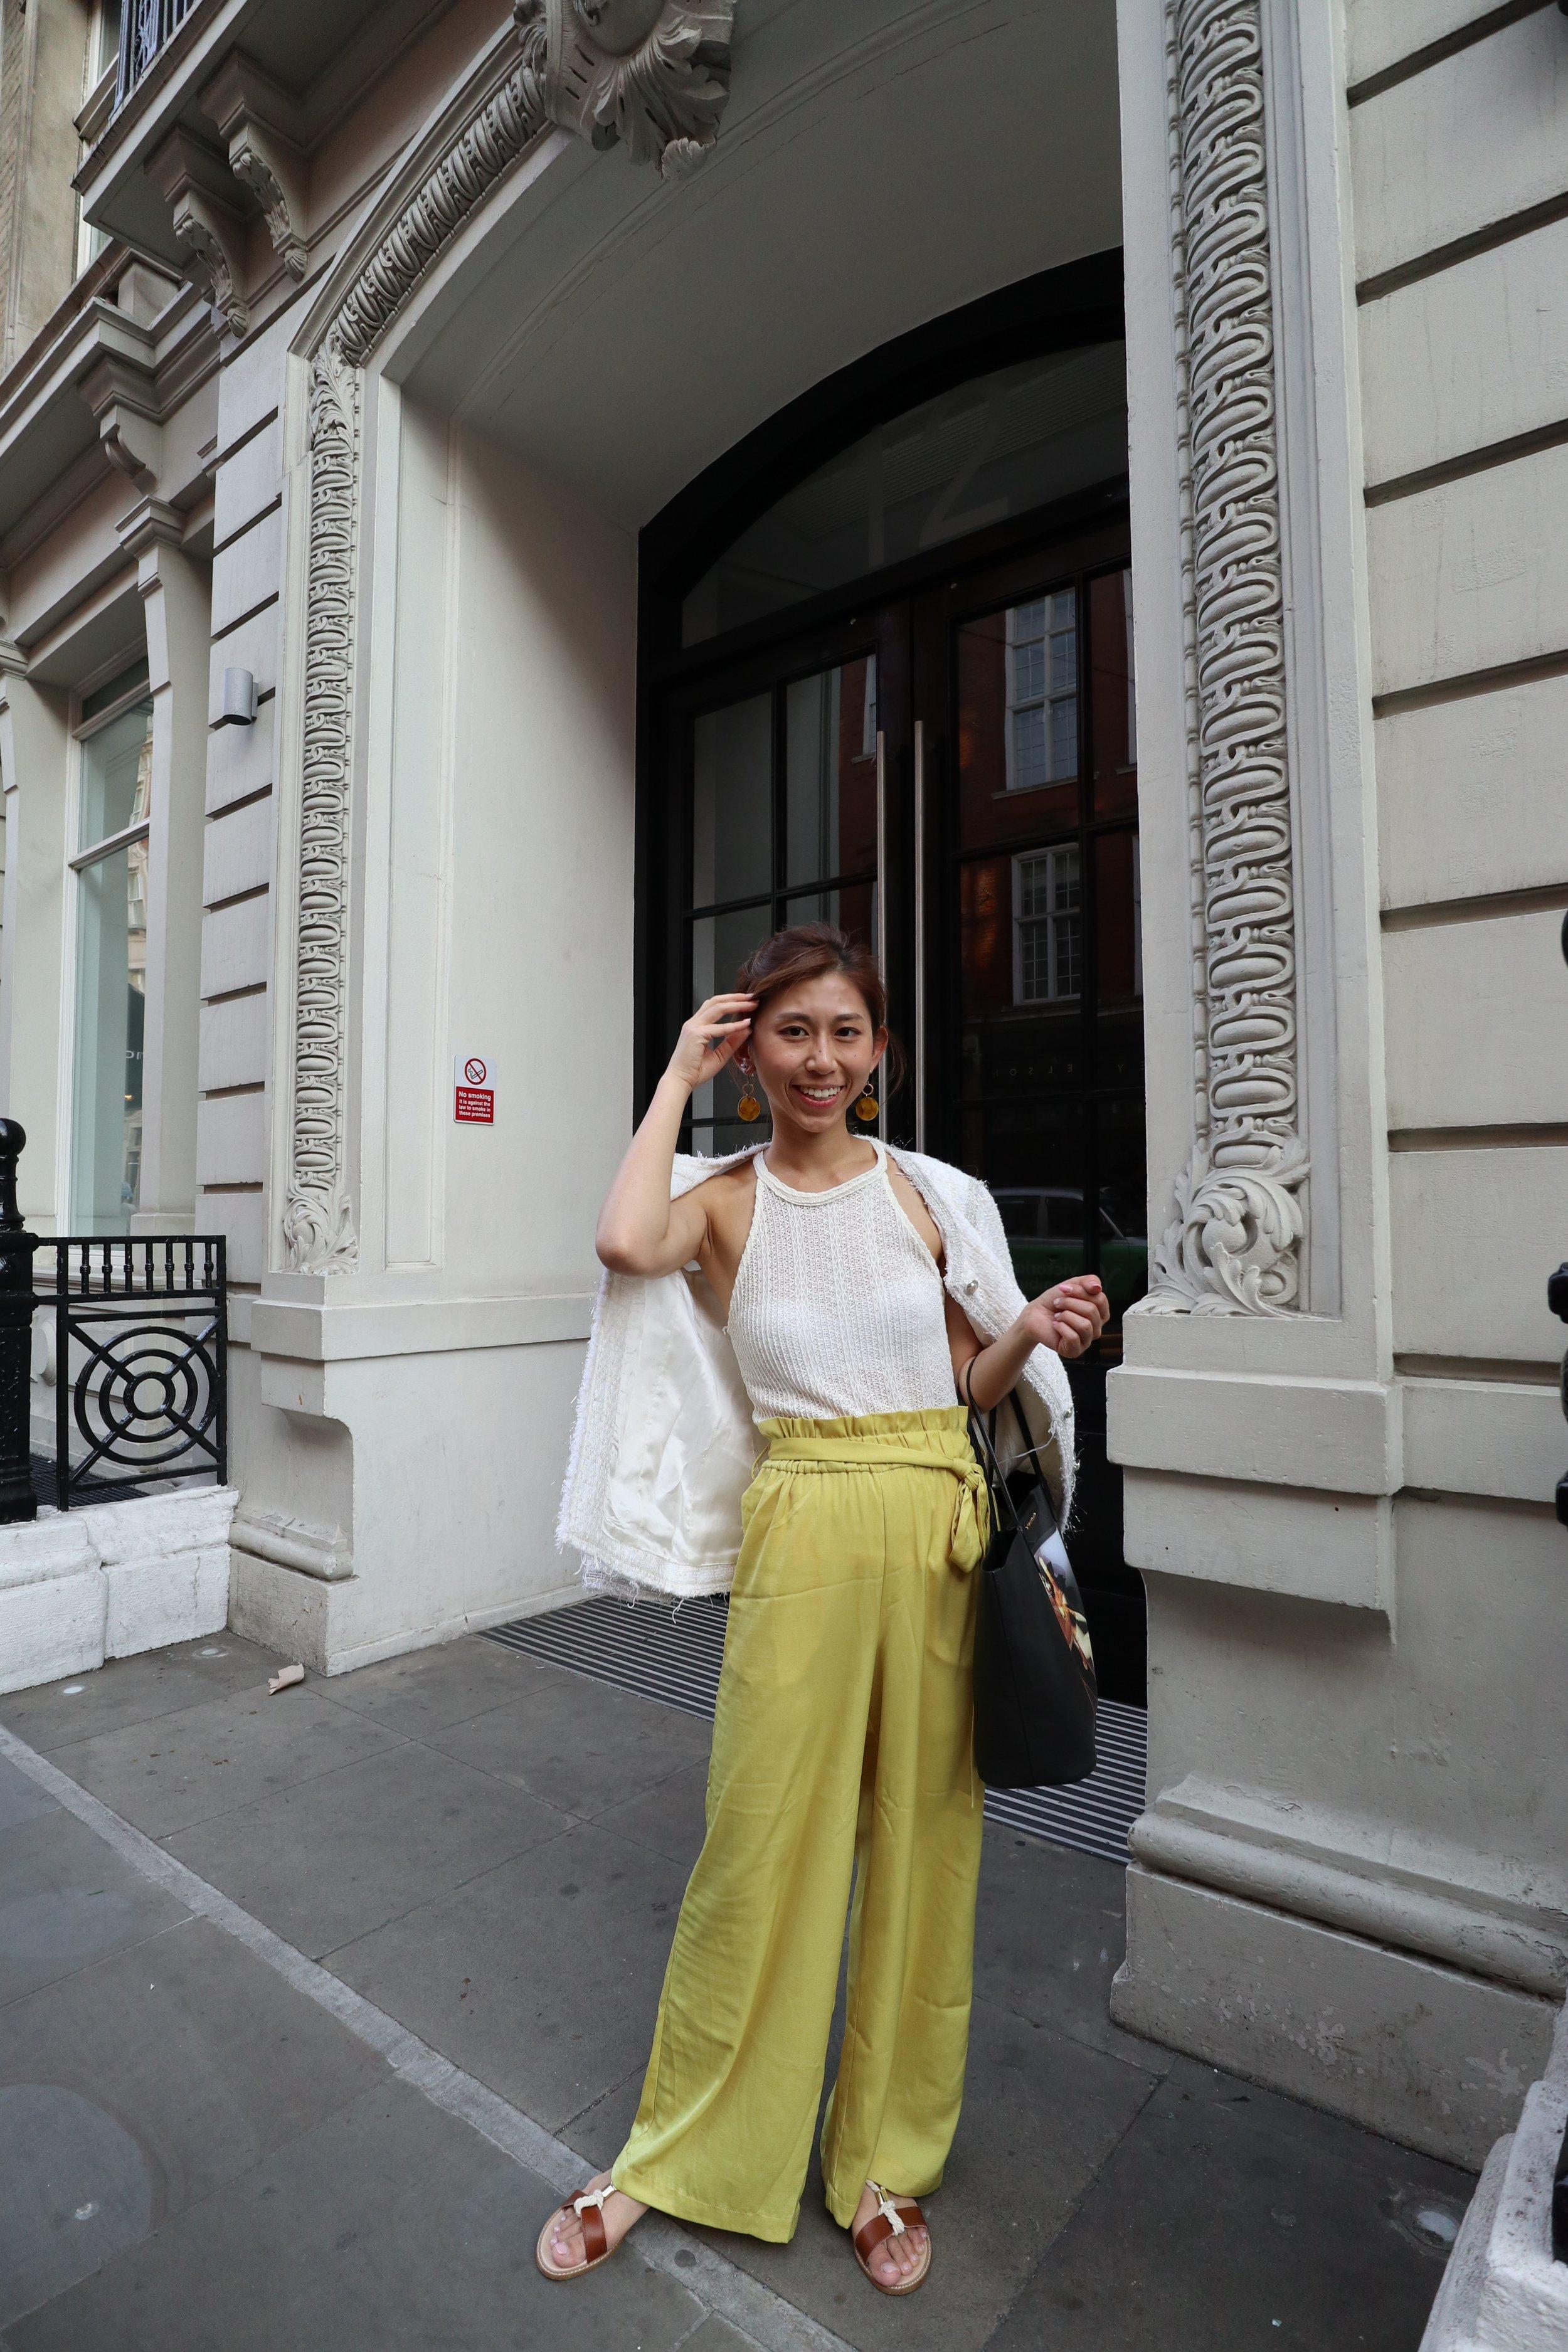 - Top: ZARA halter topBottom: MANGO yellow palazzoJacket: ZARA tweed jacketShoes: Pennyblack varnish and horsehide moccasinsBag: GIVENCHY bambi printed medium antigona shopping bag